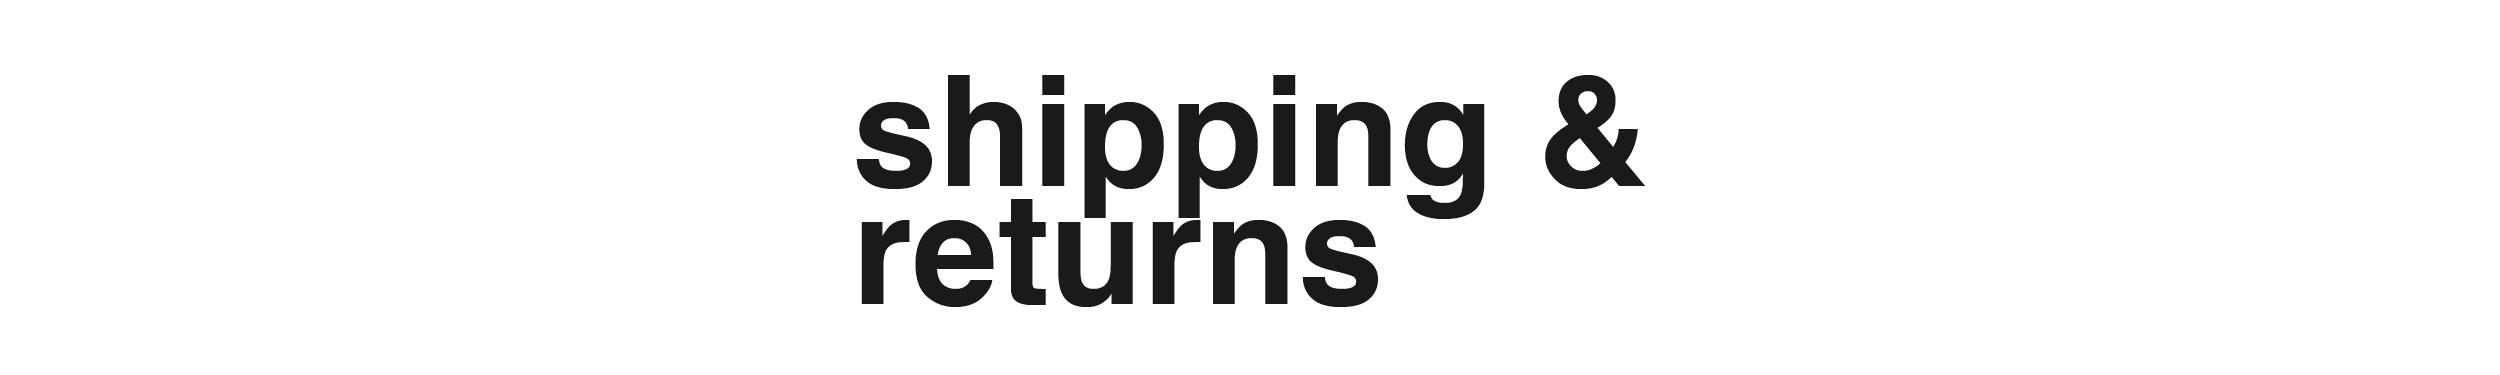 Maria-Castelli-Shipping-Returns.jpg